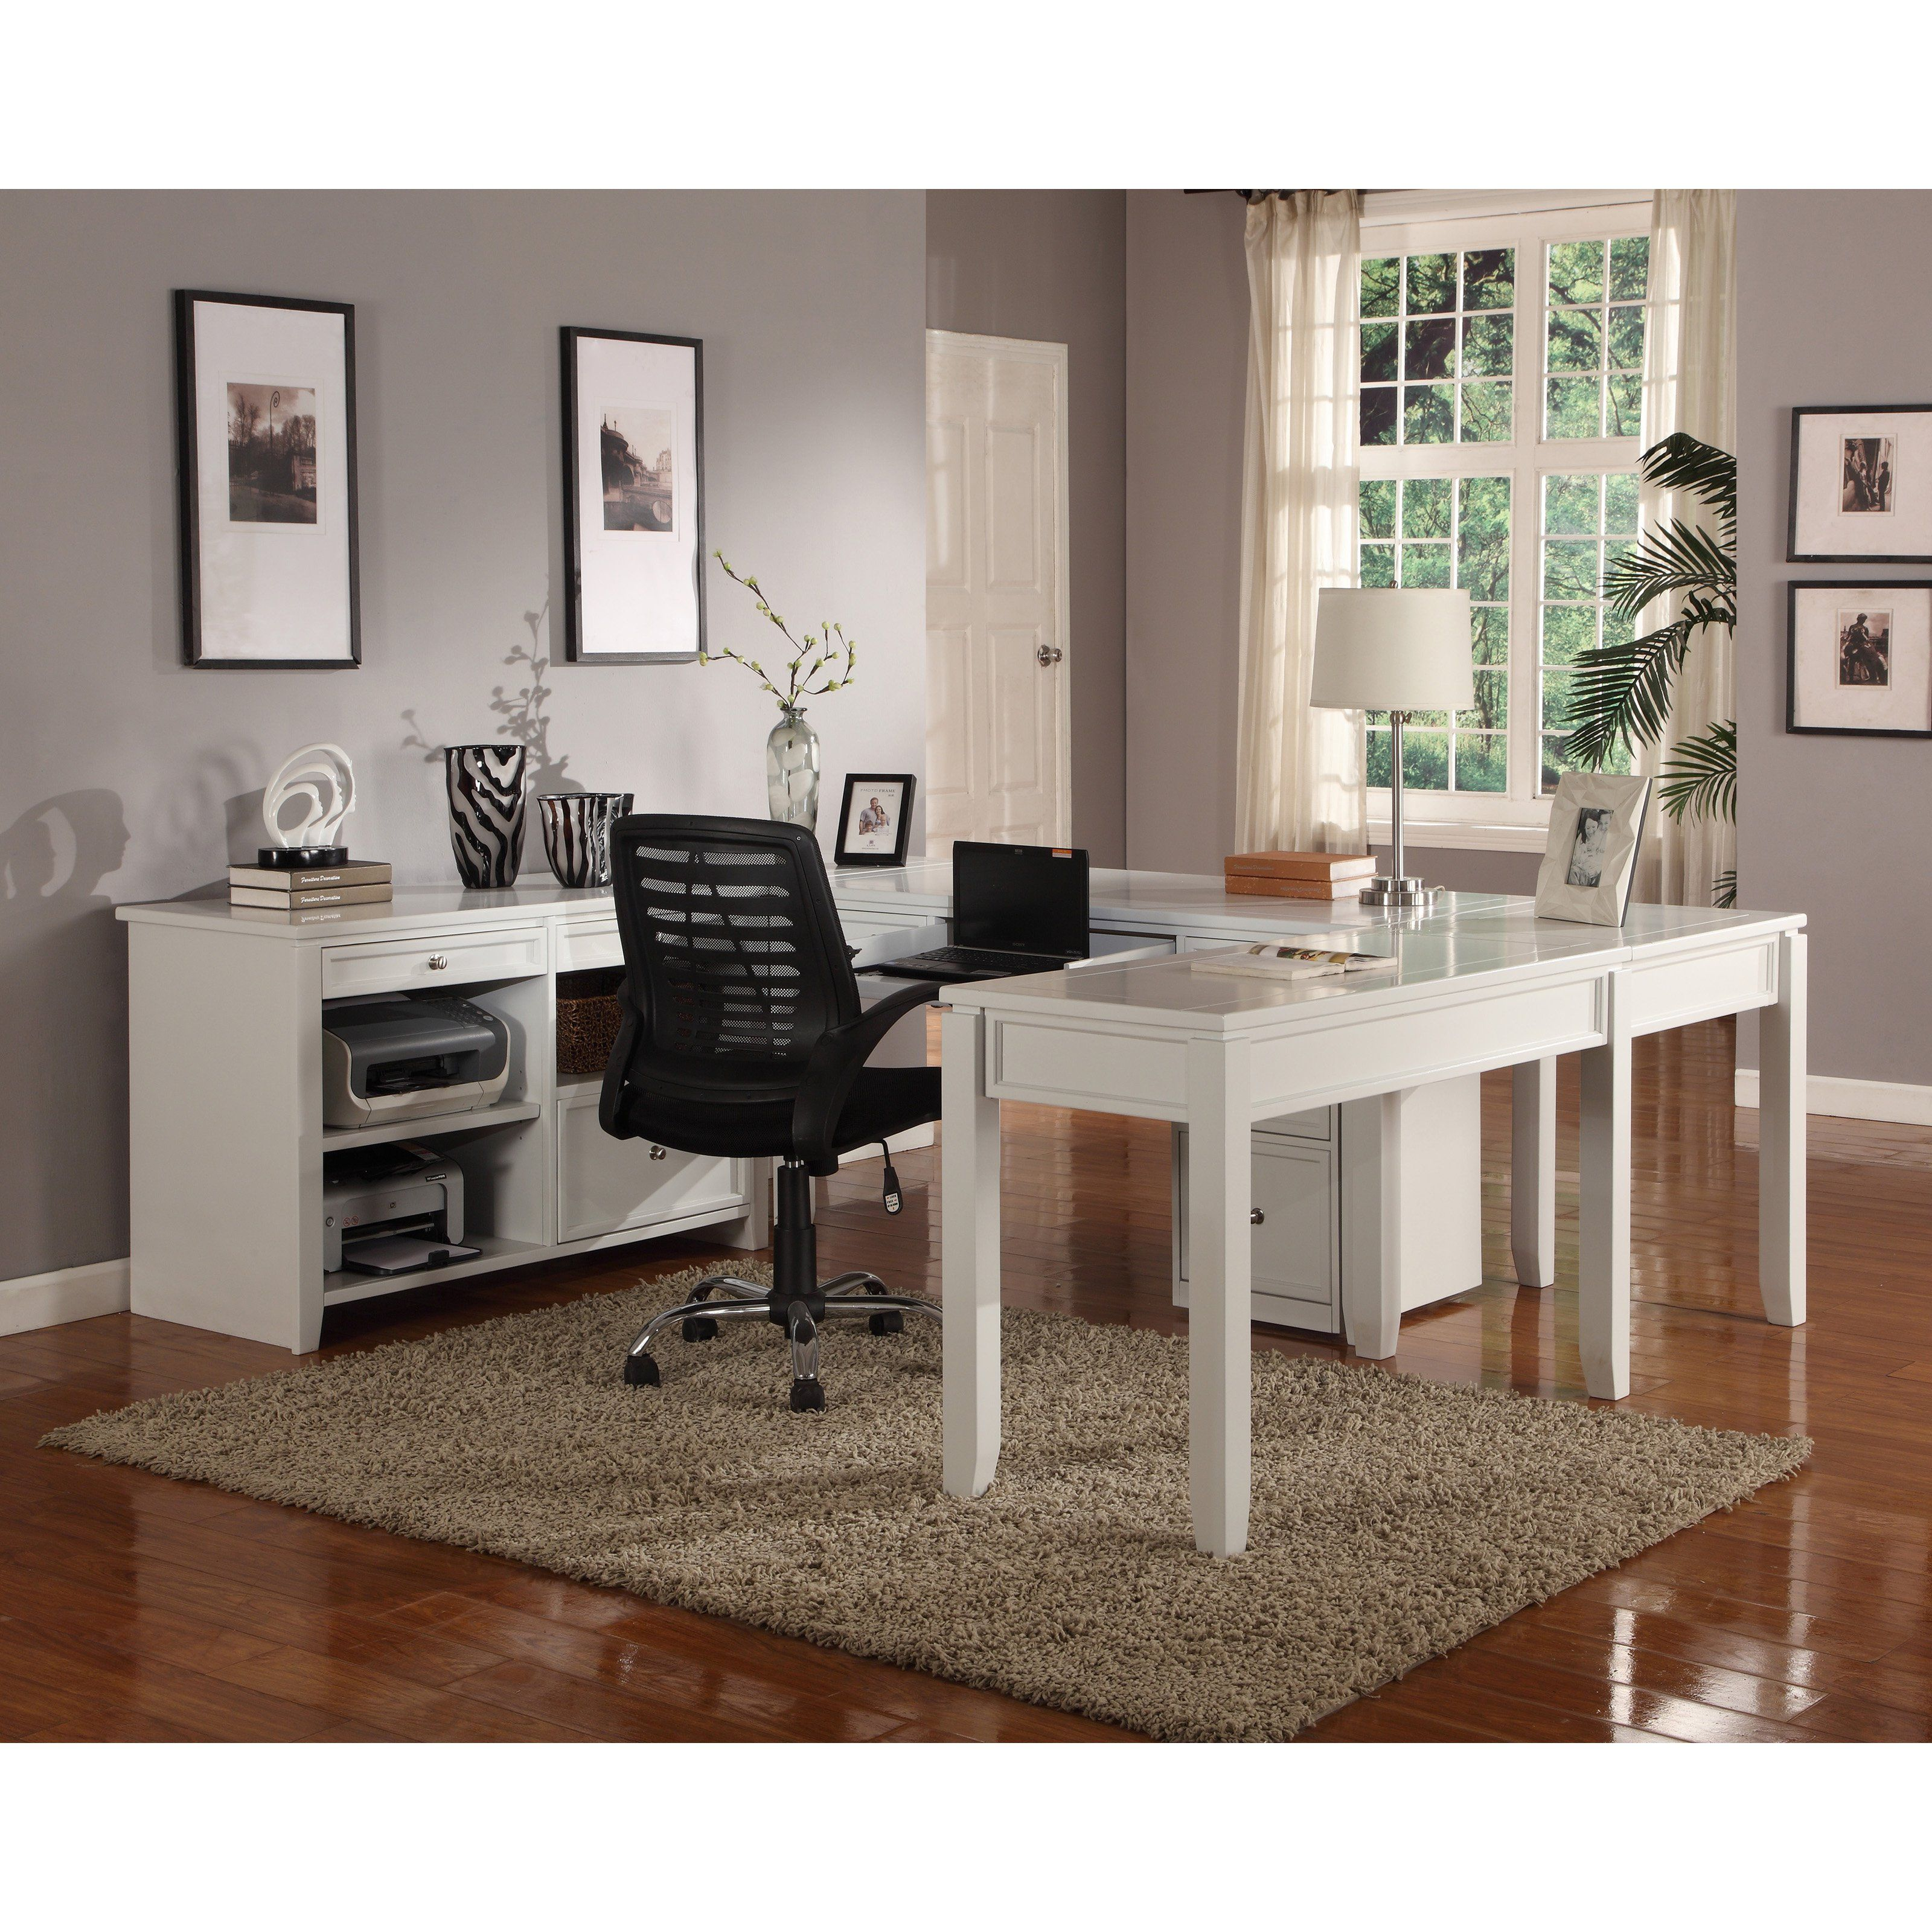 Parker House Boca U Shaped Desk With Credenza Cottage White 1956 22 Hayneedle